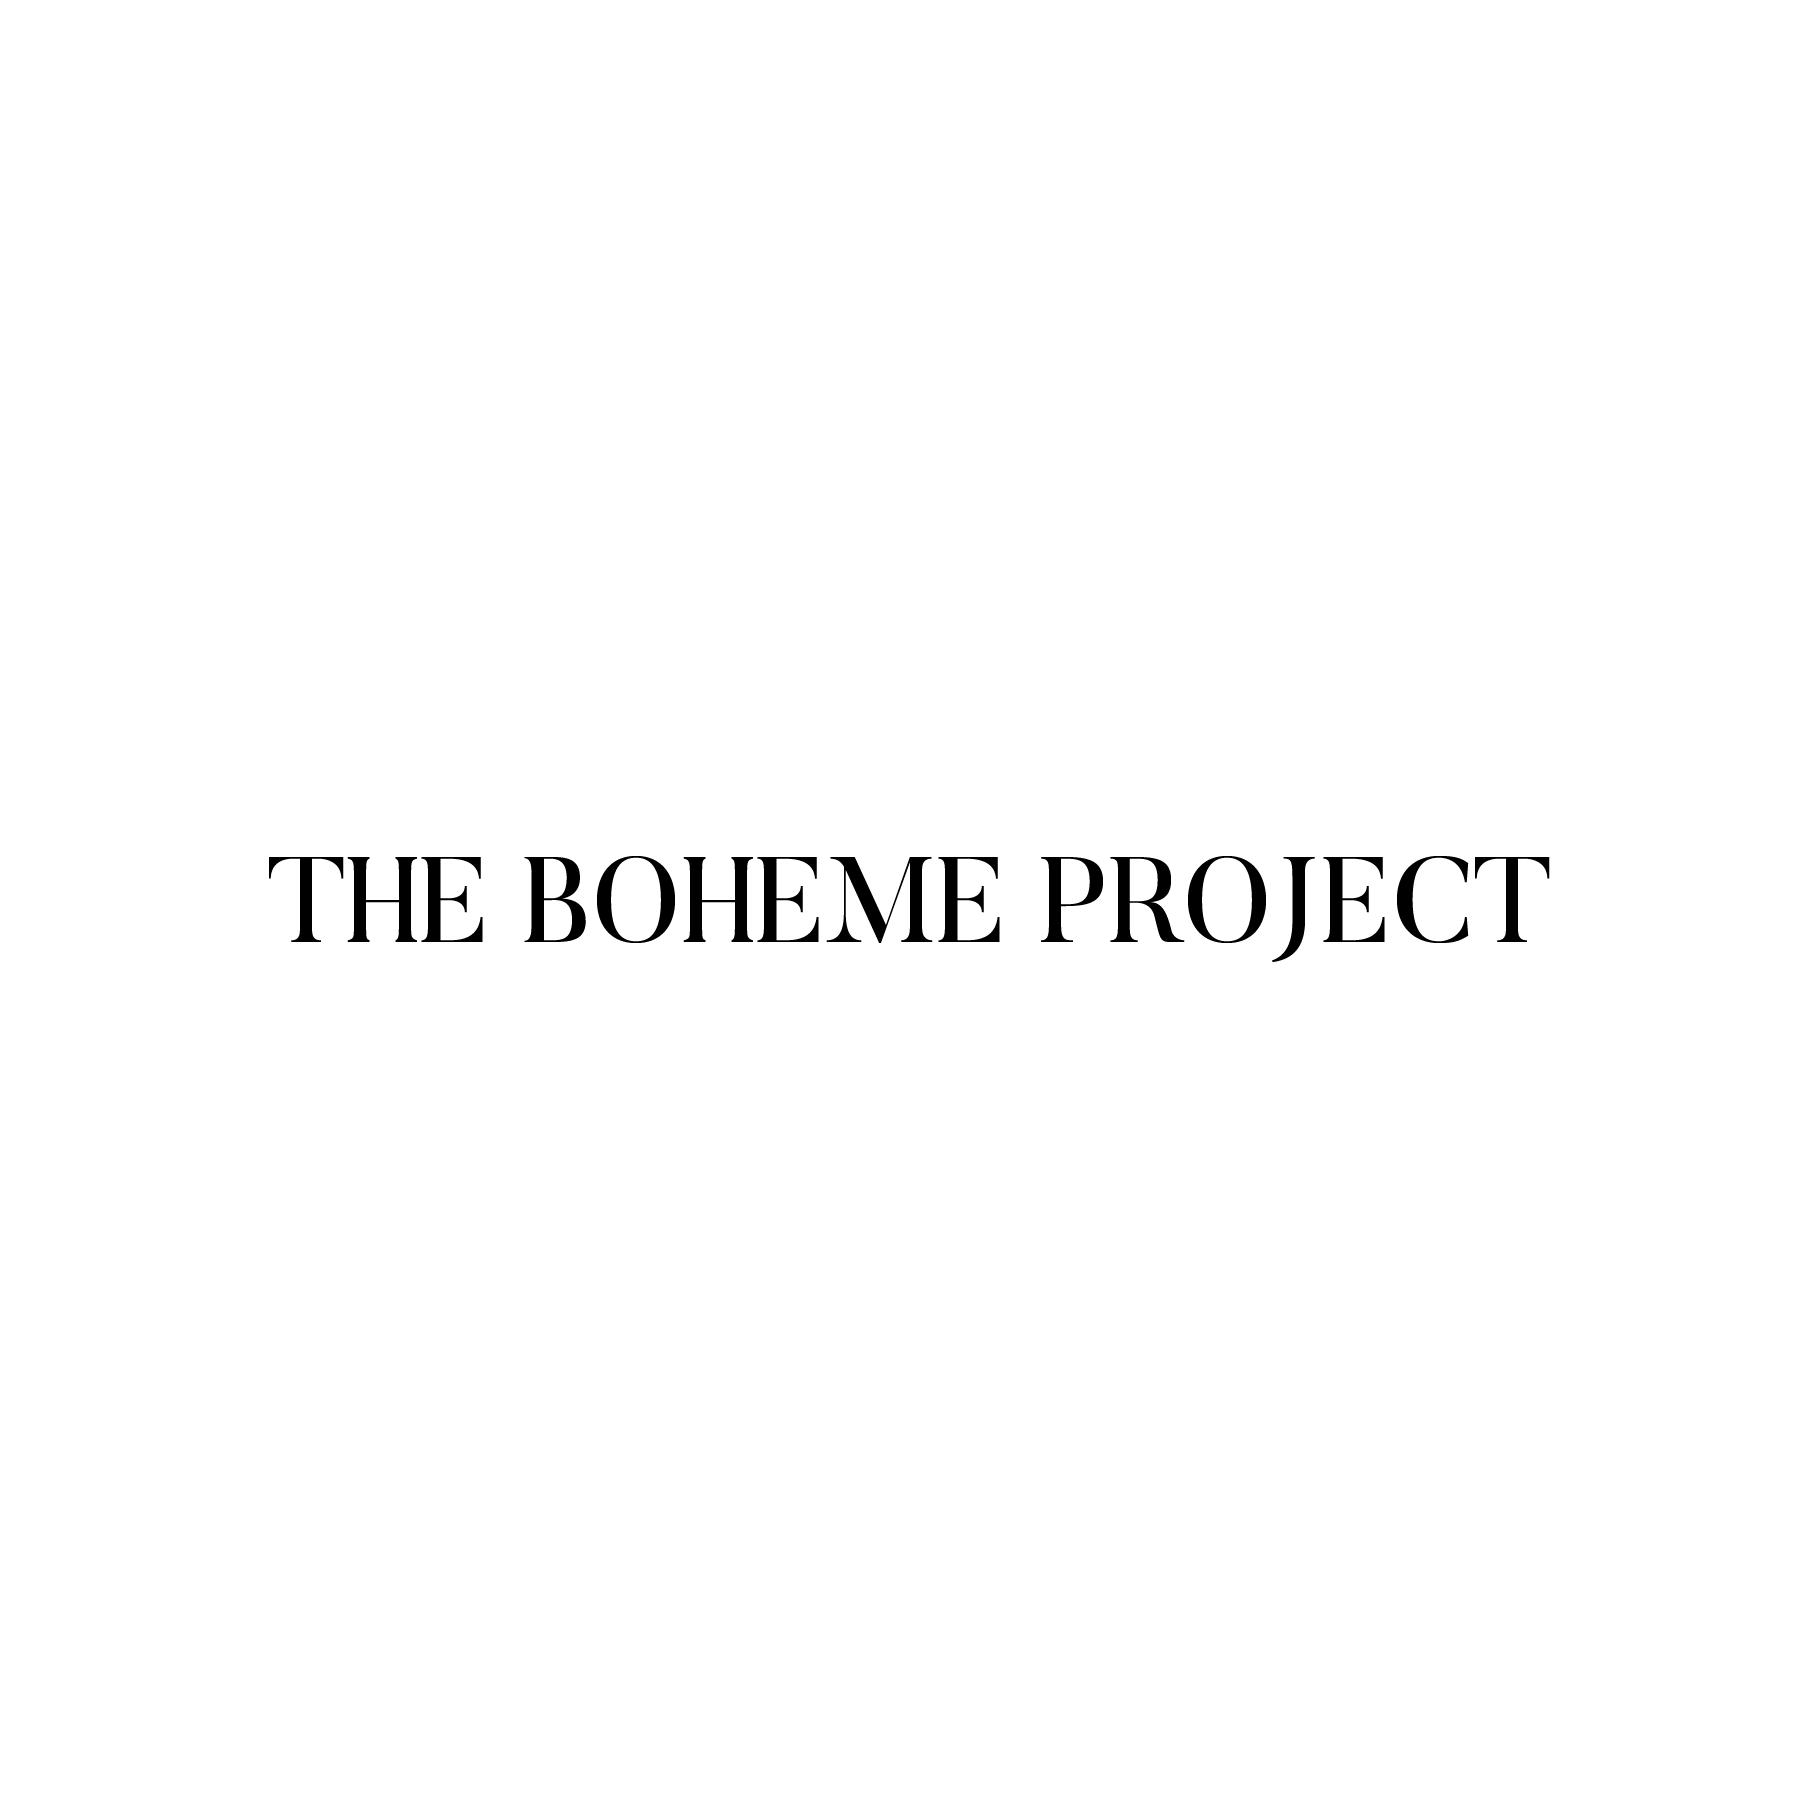 The Boheme Project